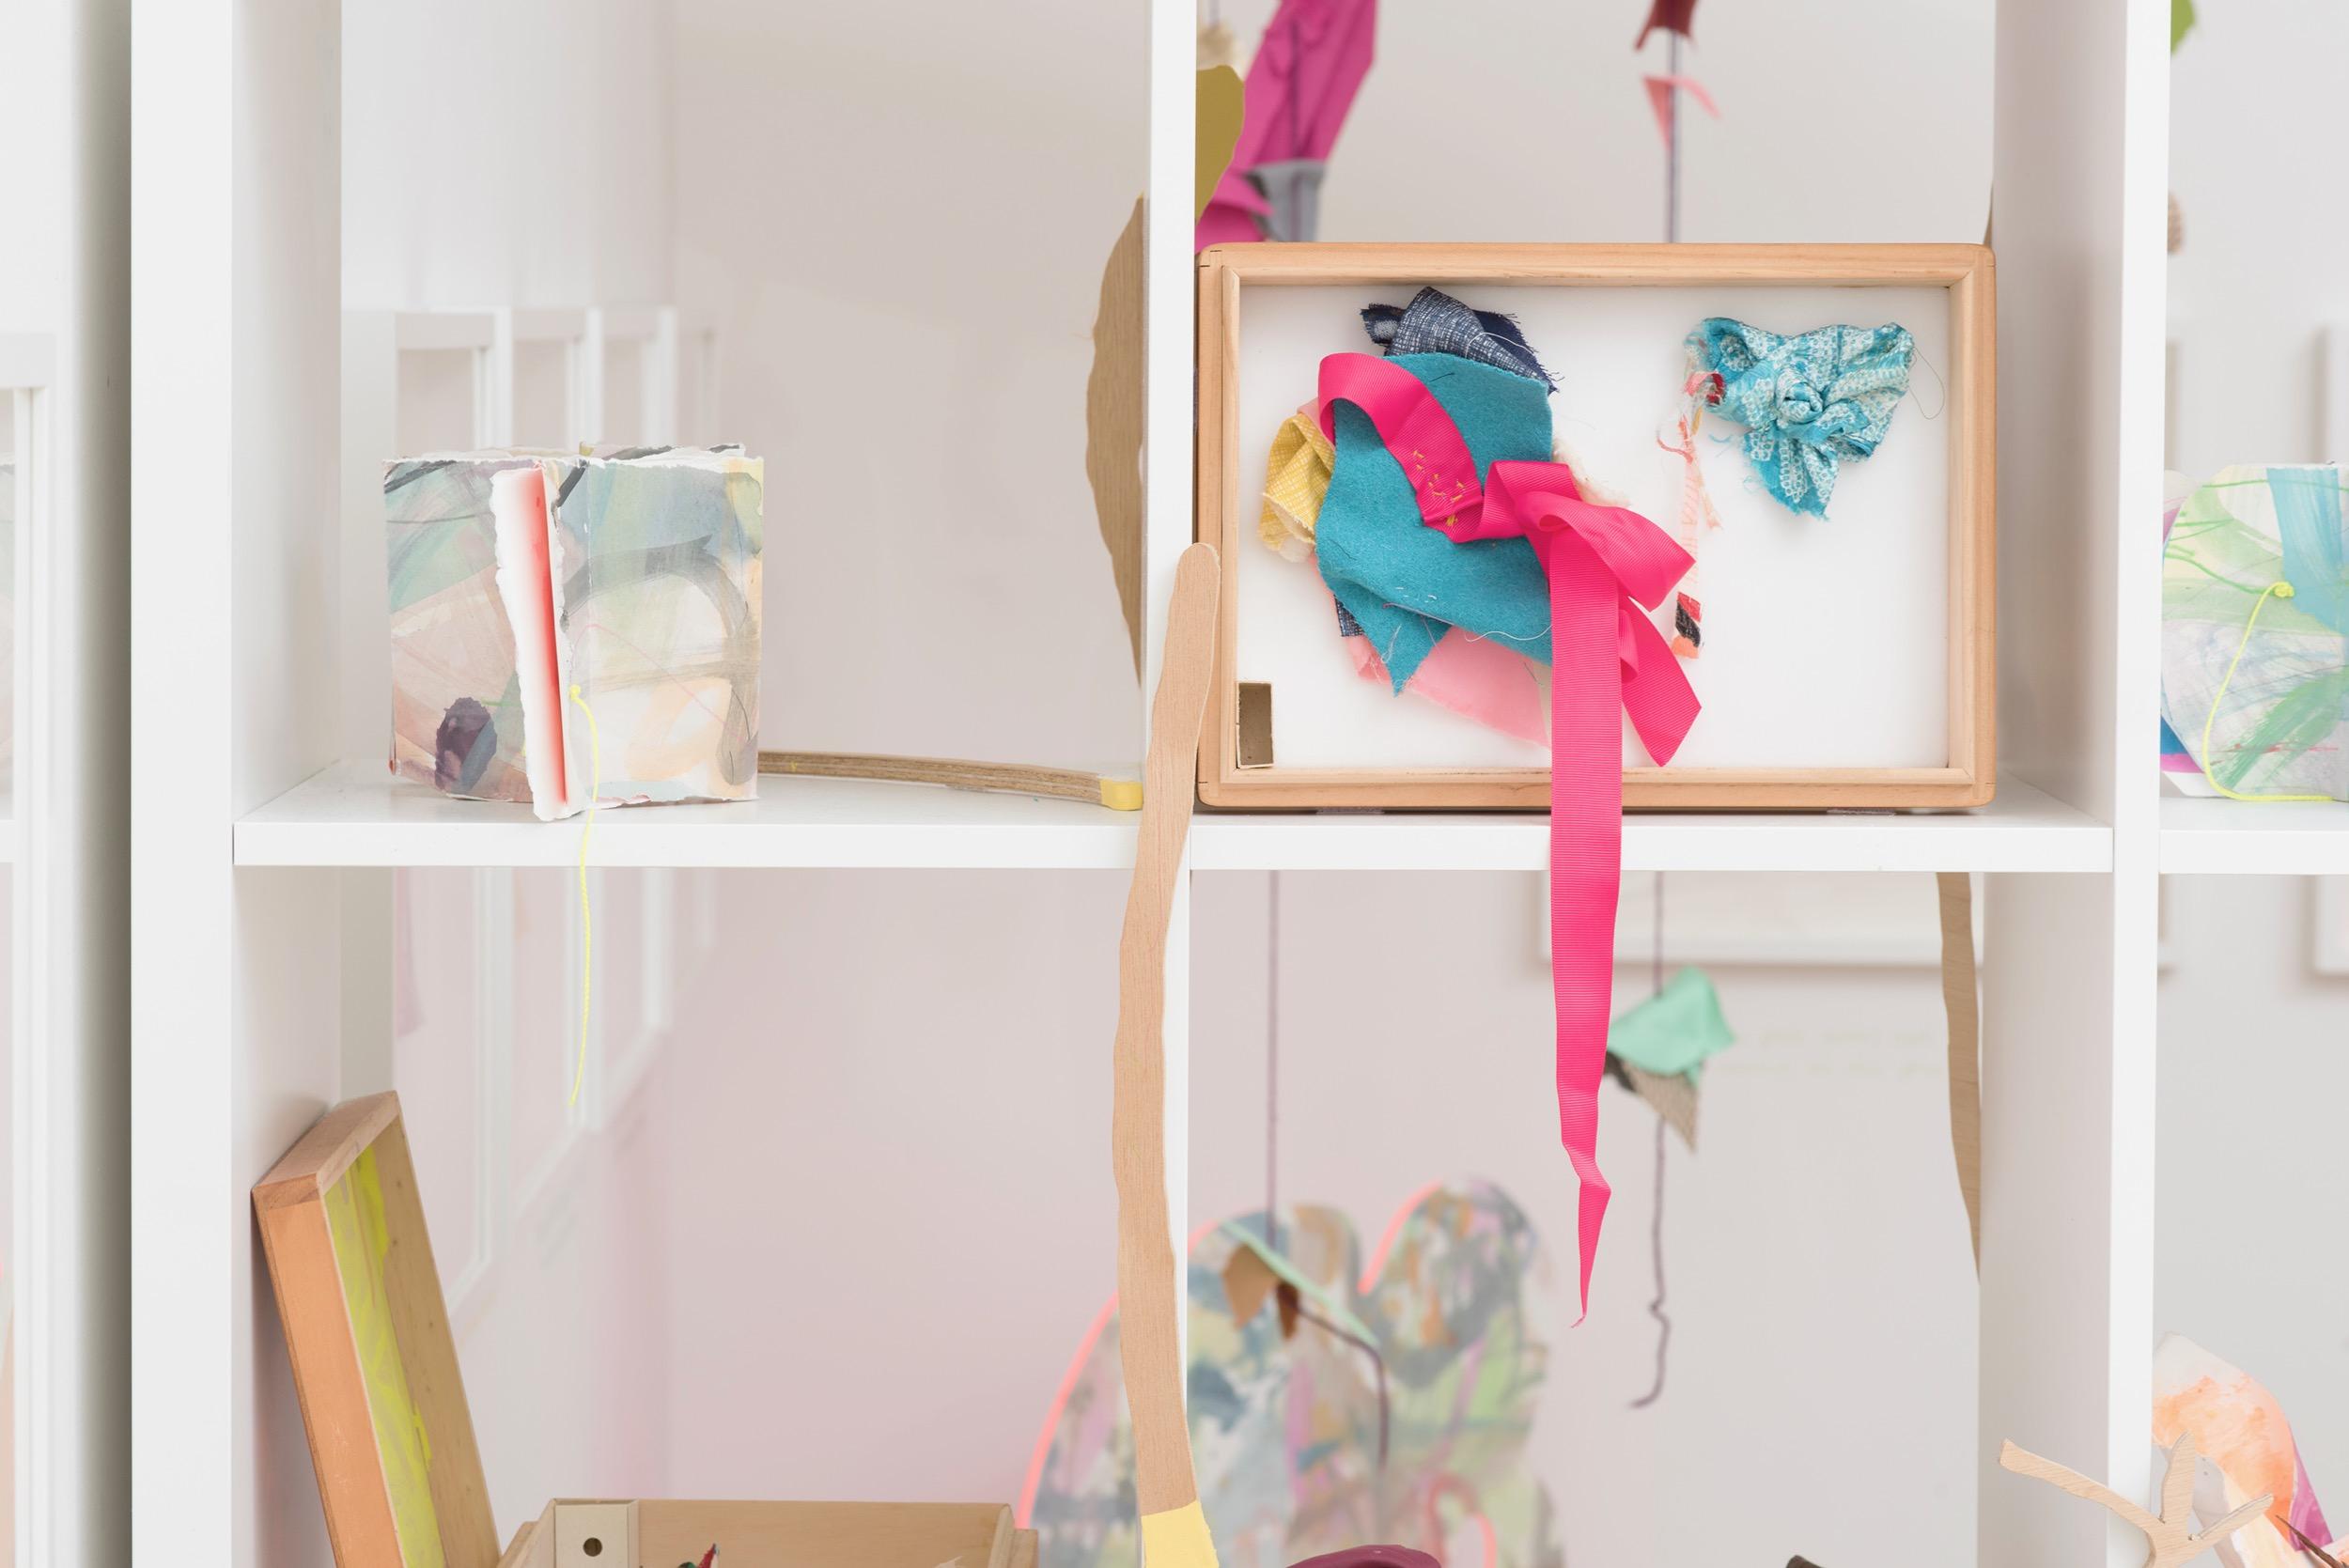 Lanyon Bug Boxes, 2018 (right)